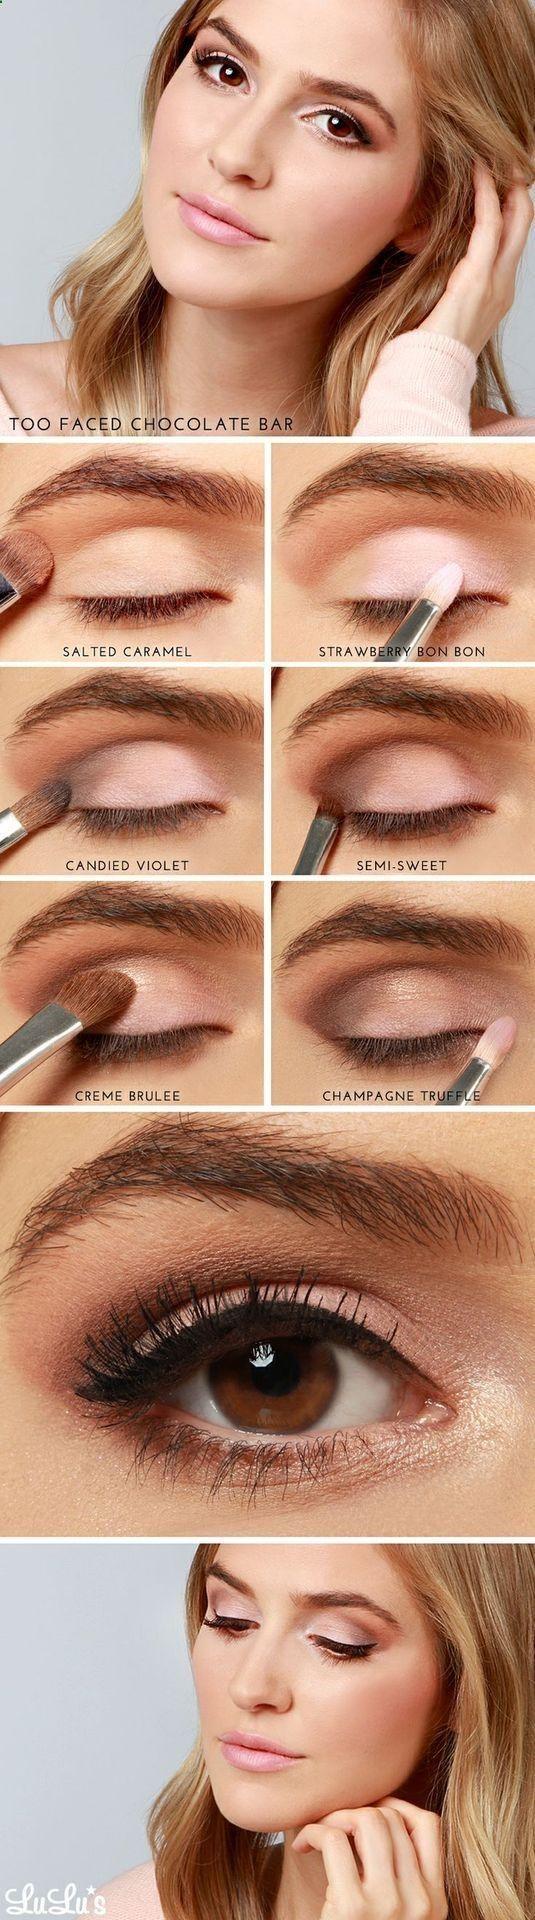 Too Faced Chocolate Bar. Soft day eye makeup tutorial #evatornadoblog | gnarlyhair.comgnarlyhair.com